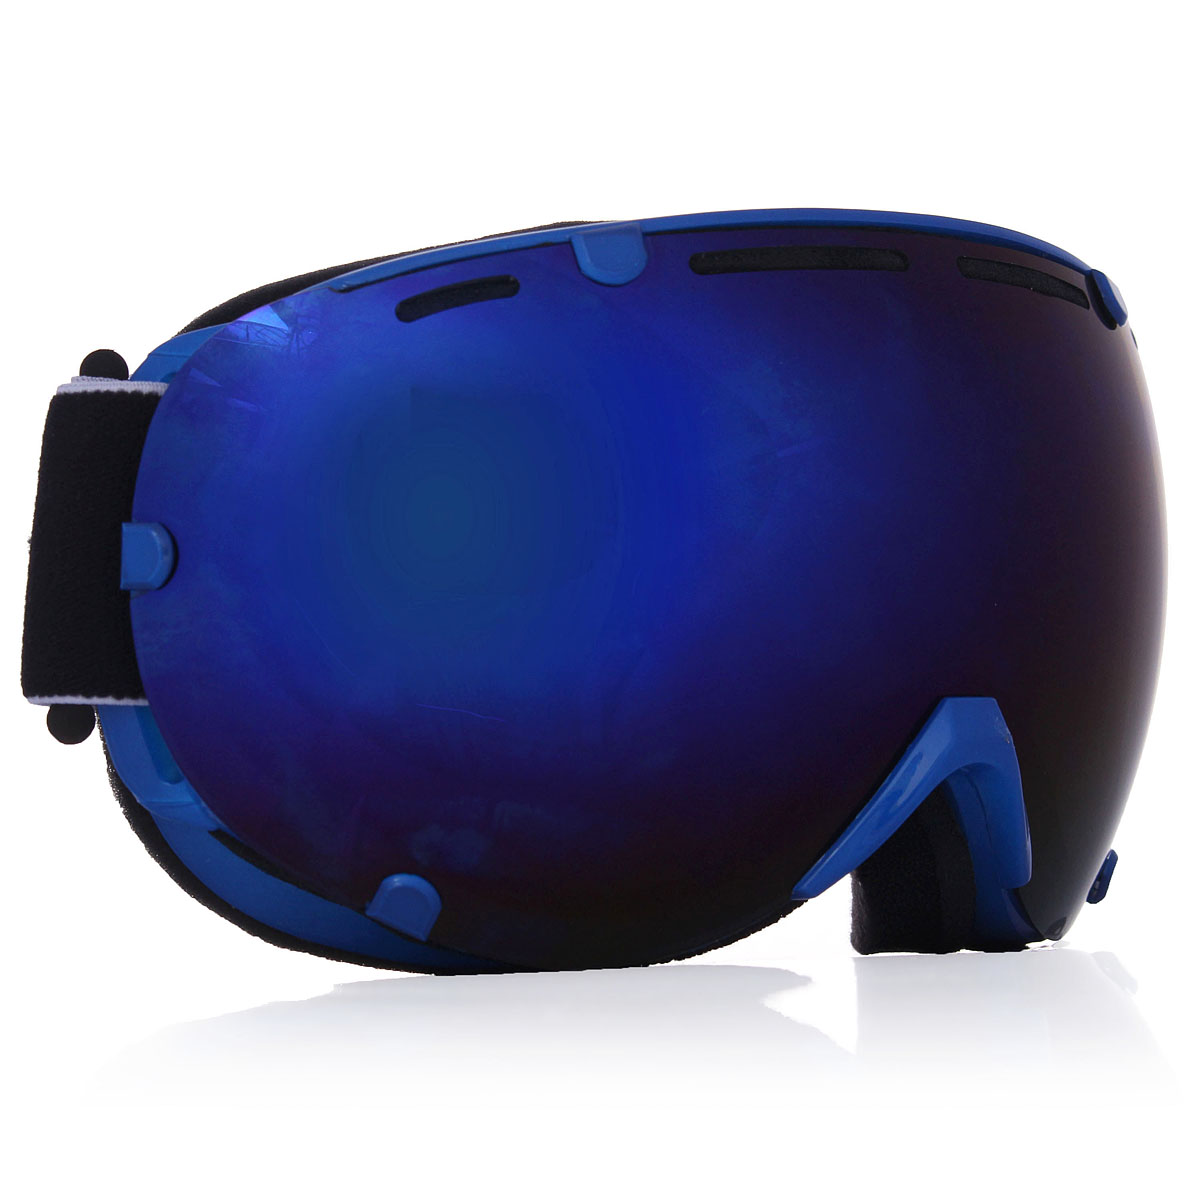 4 Colores Profesional Adulto Unisex Snowboard Gafas de Esquí UV Antivaho Gafas d